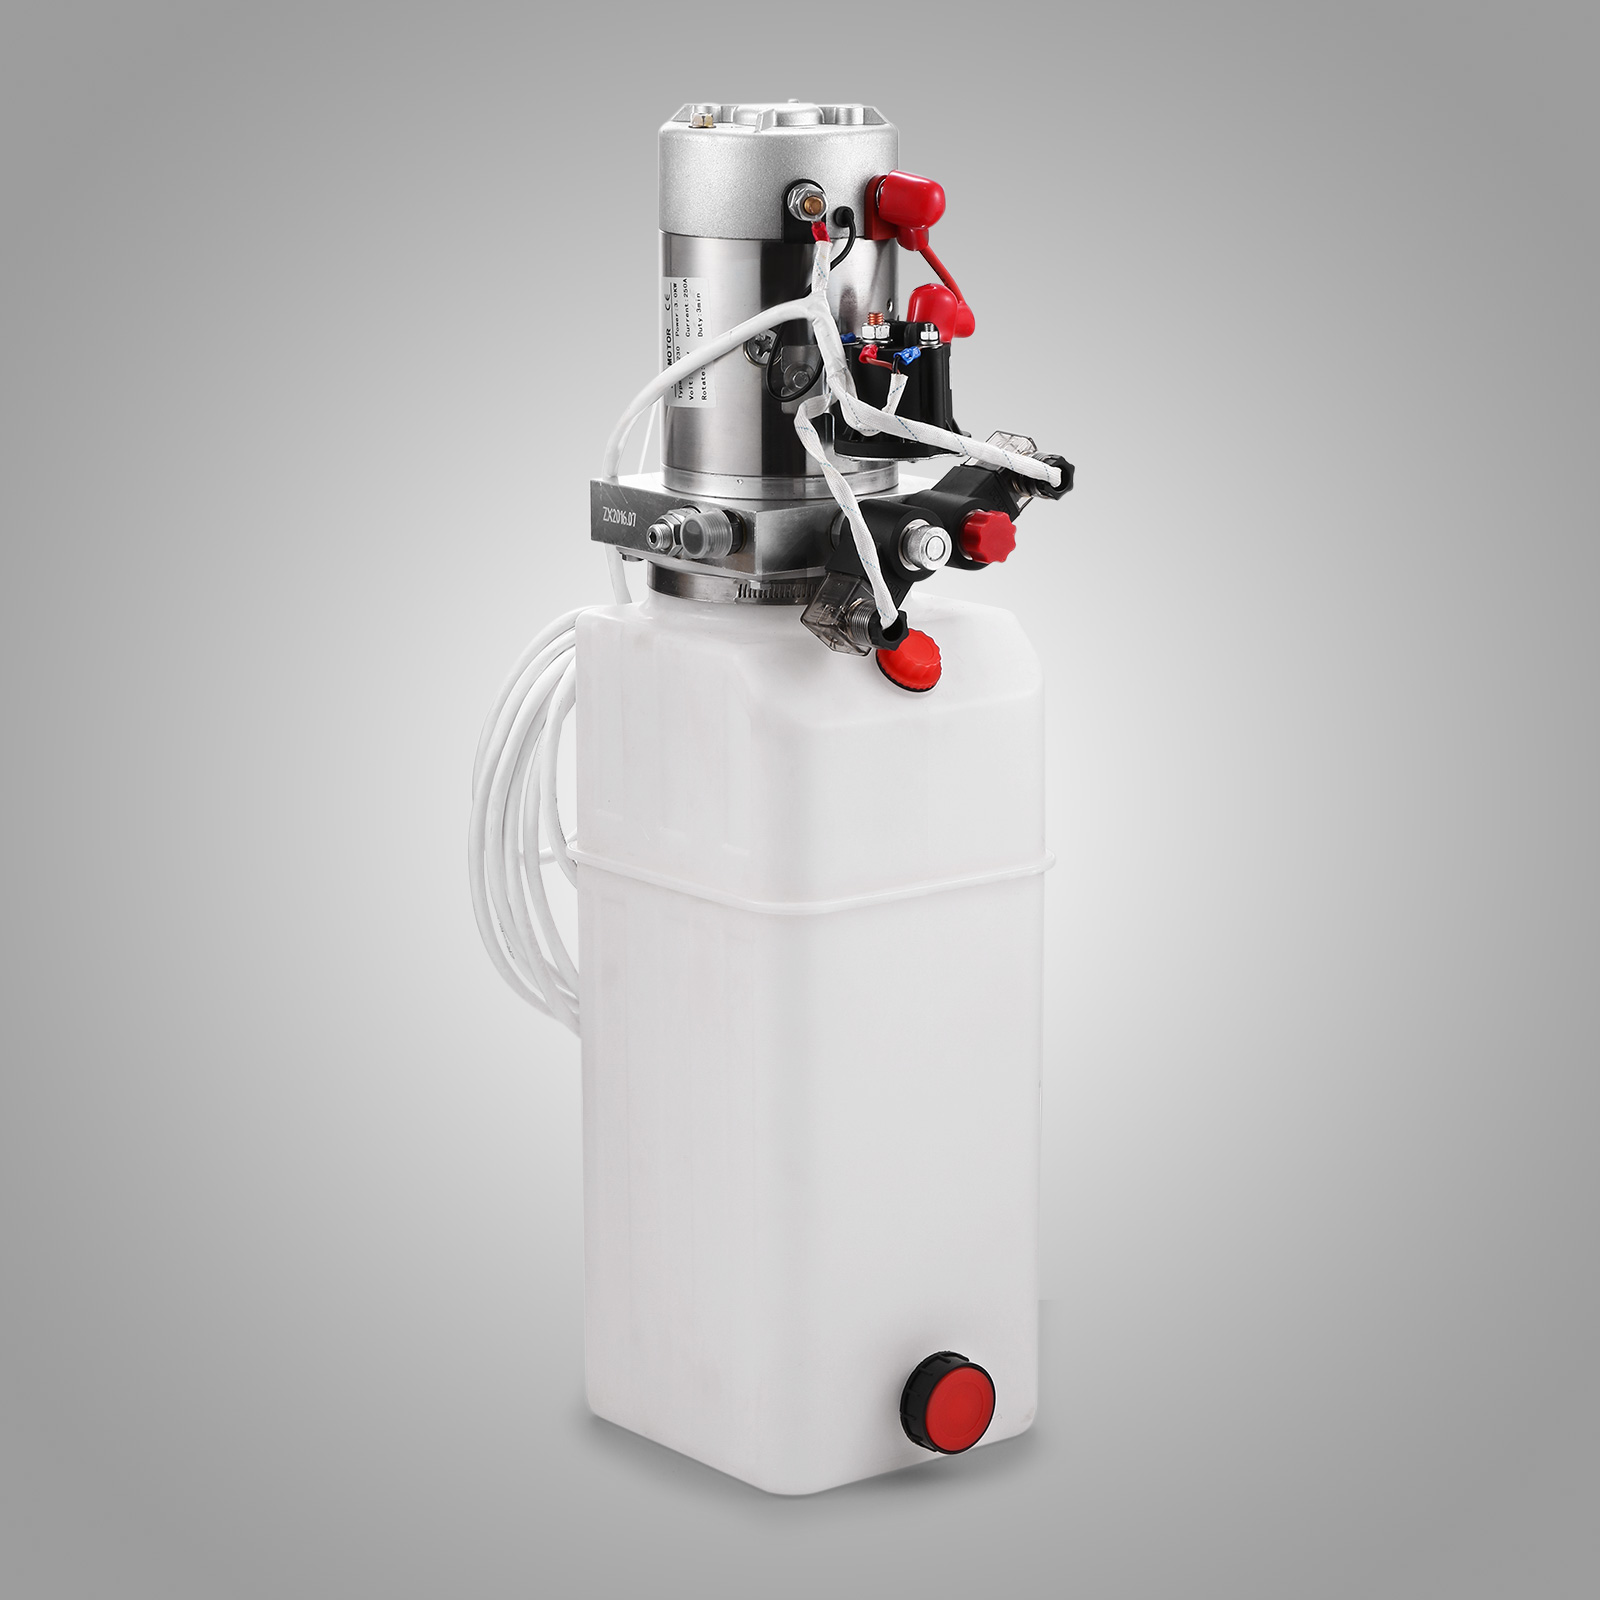 new double acting hydraulic pump 12v dump trailer 10. Black Bedroom Furniture Sets. Home Design Ideas